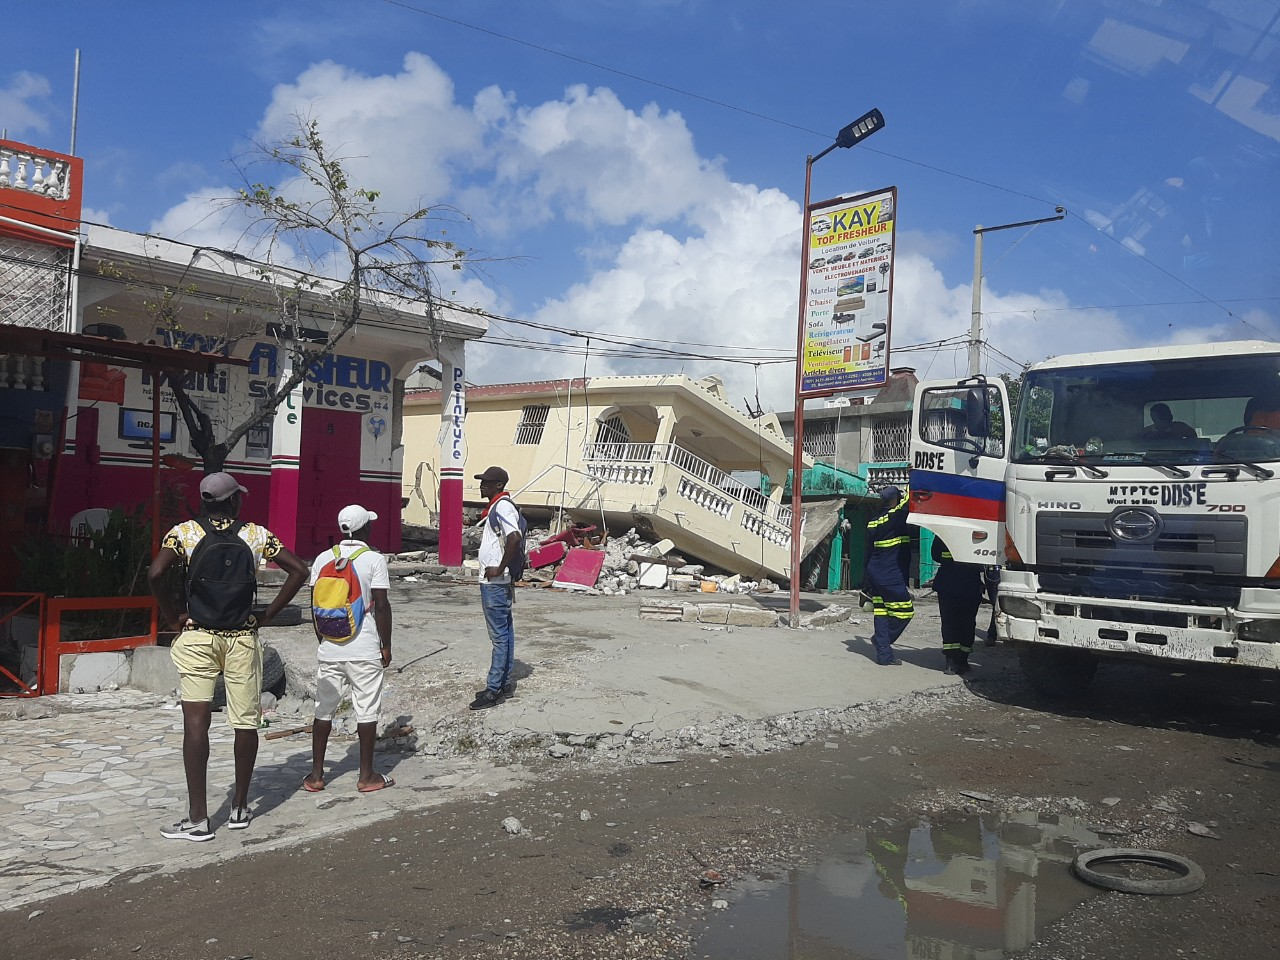 Destruction in Haiti